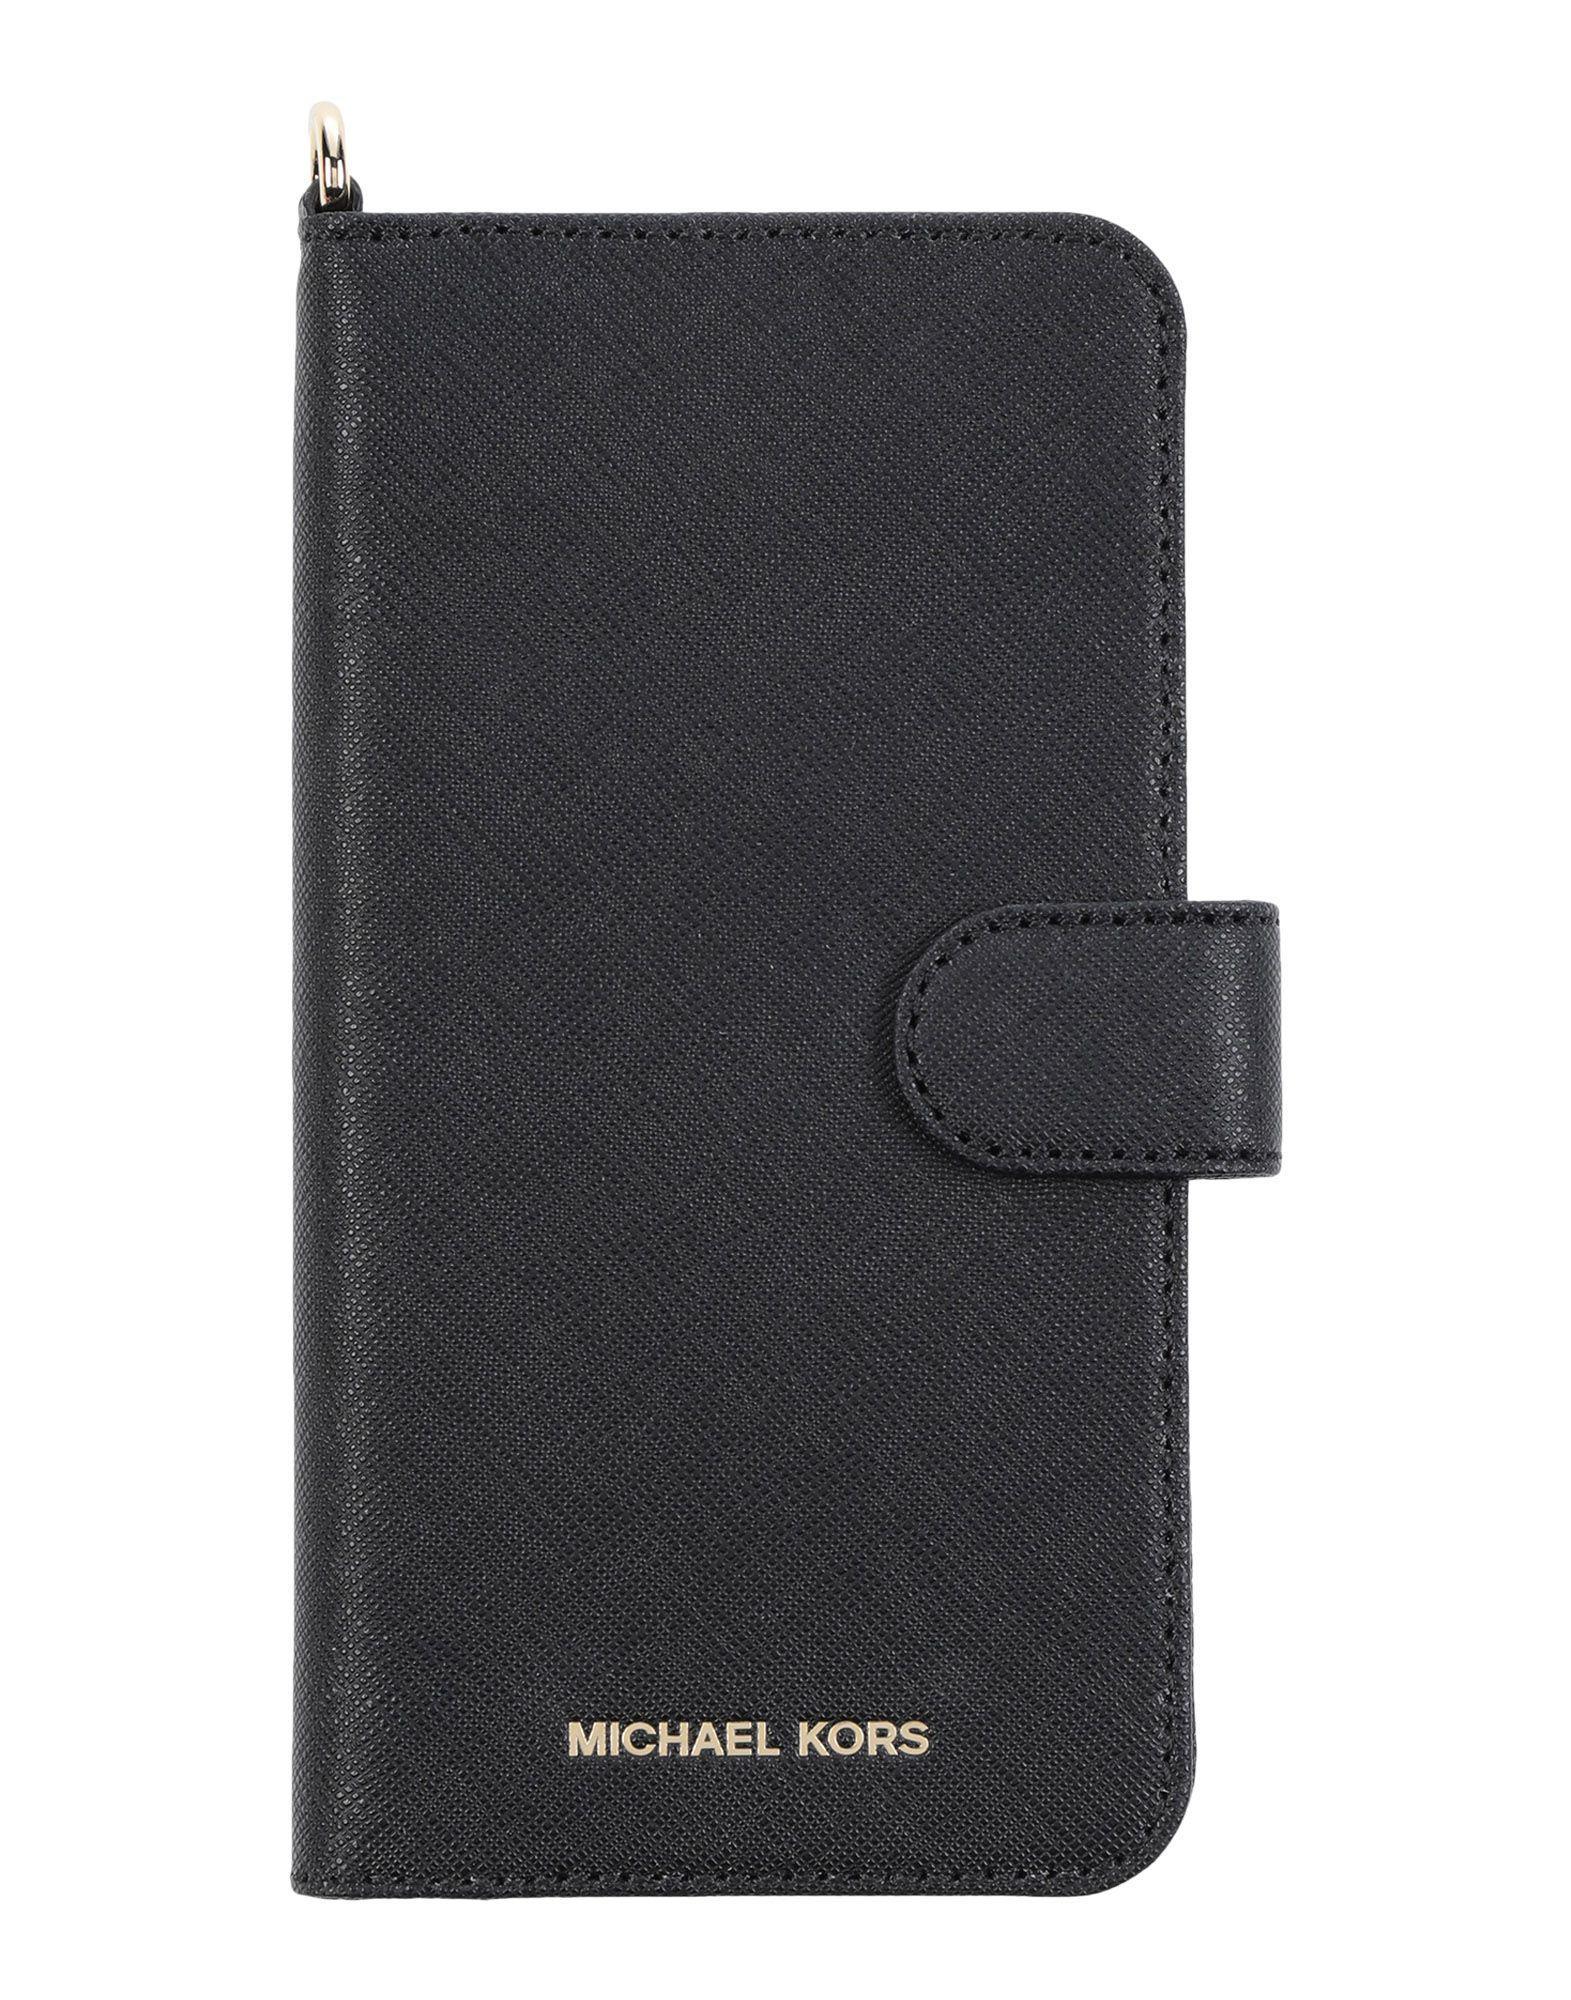 ce3c54542c698 Lyst - Michael Michael Kors Hi-tech Accessories in Black